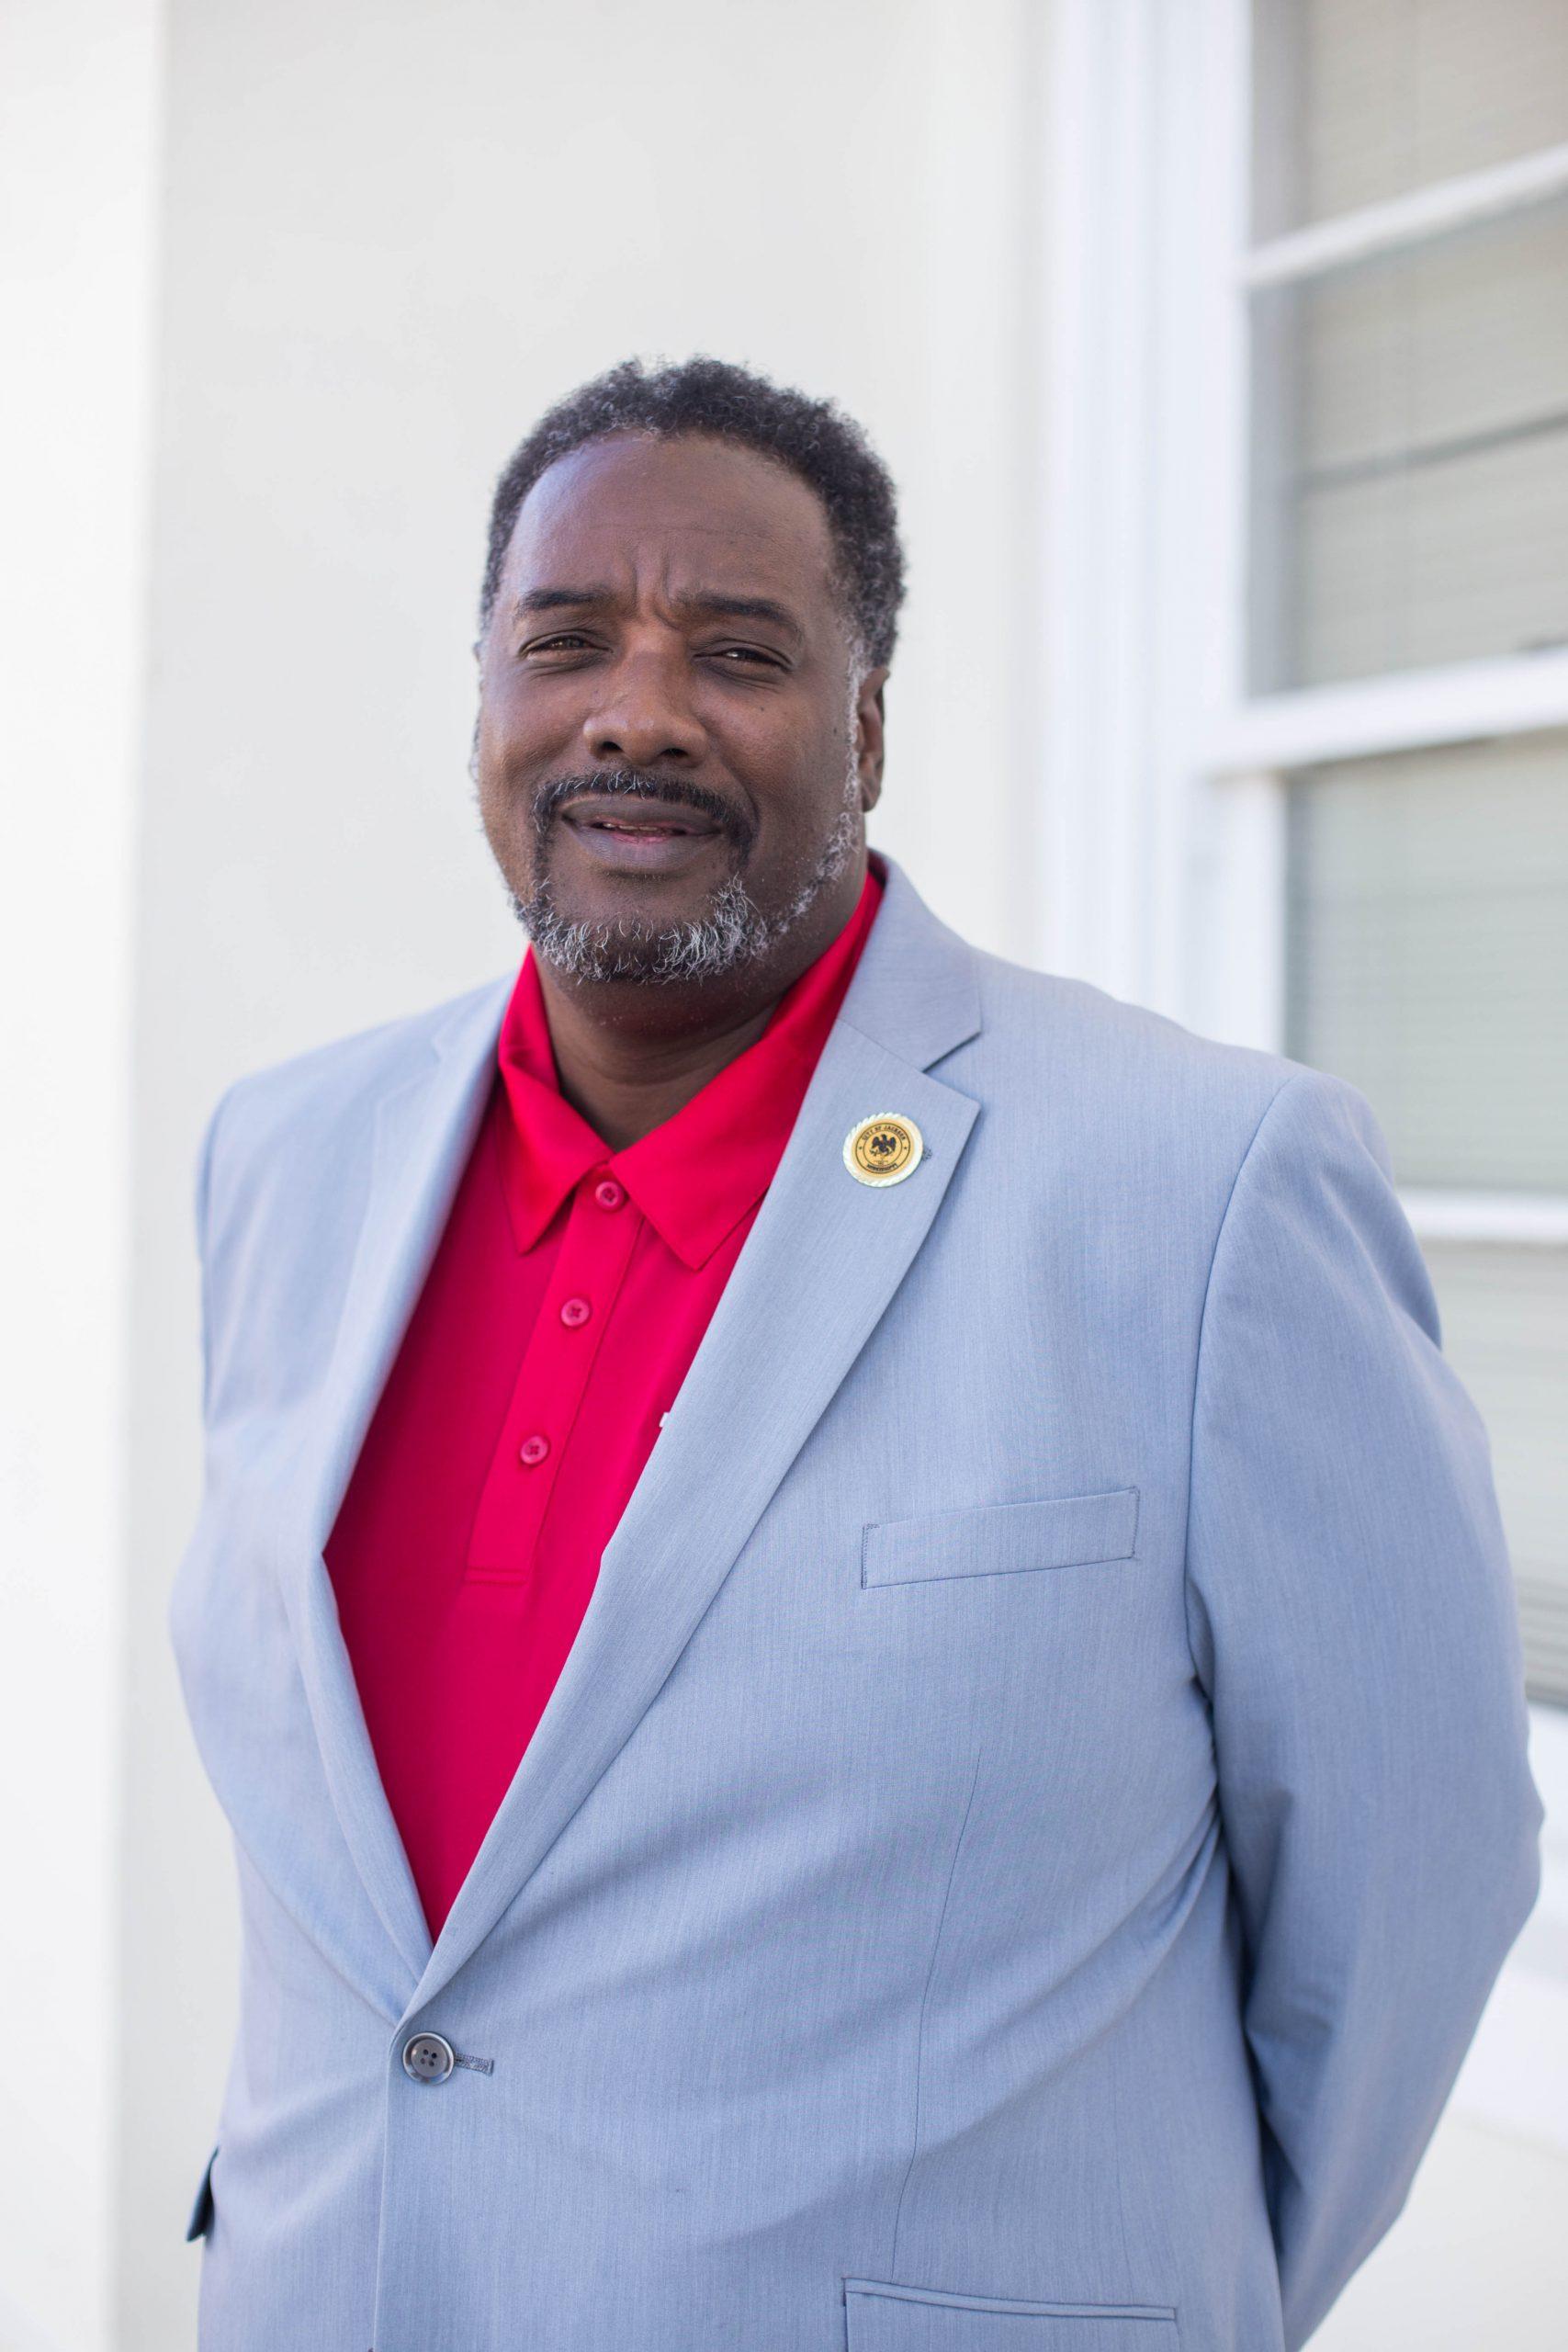 Ison B. Harris, Jr, Director of Parks & Recreation